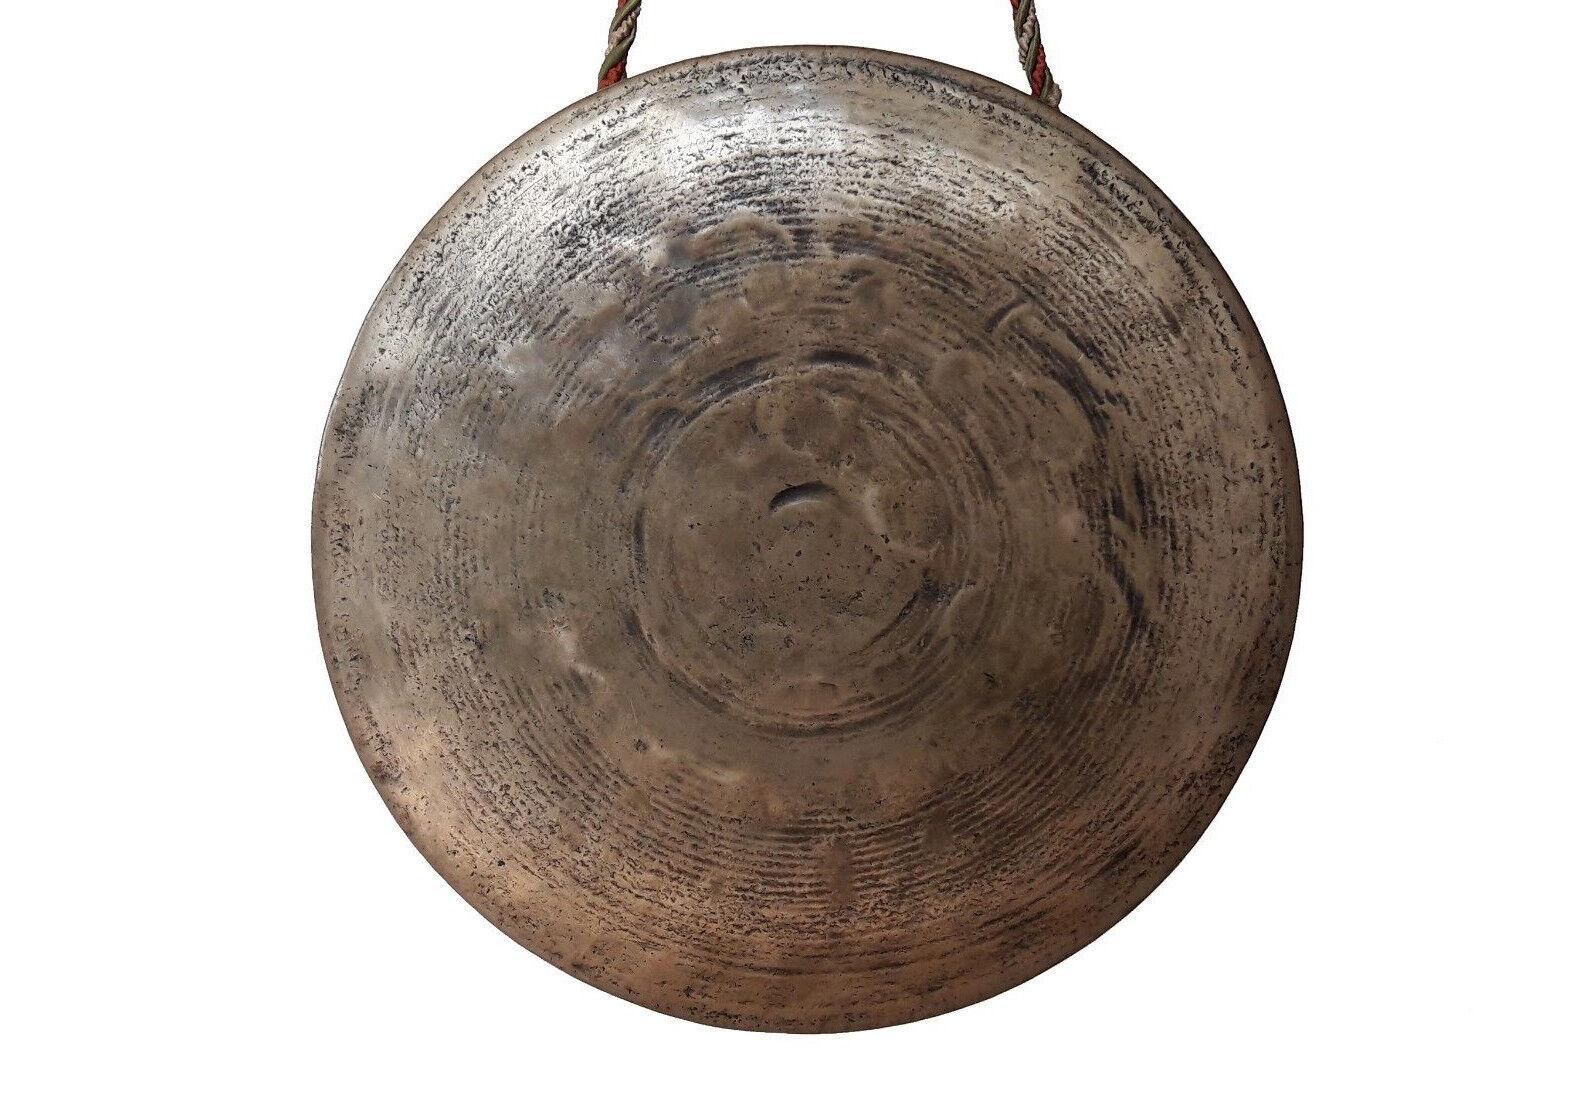 14   36cm  JING _ Used Korean Gong Cymbal    Professional Quality  Jing  Z4